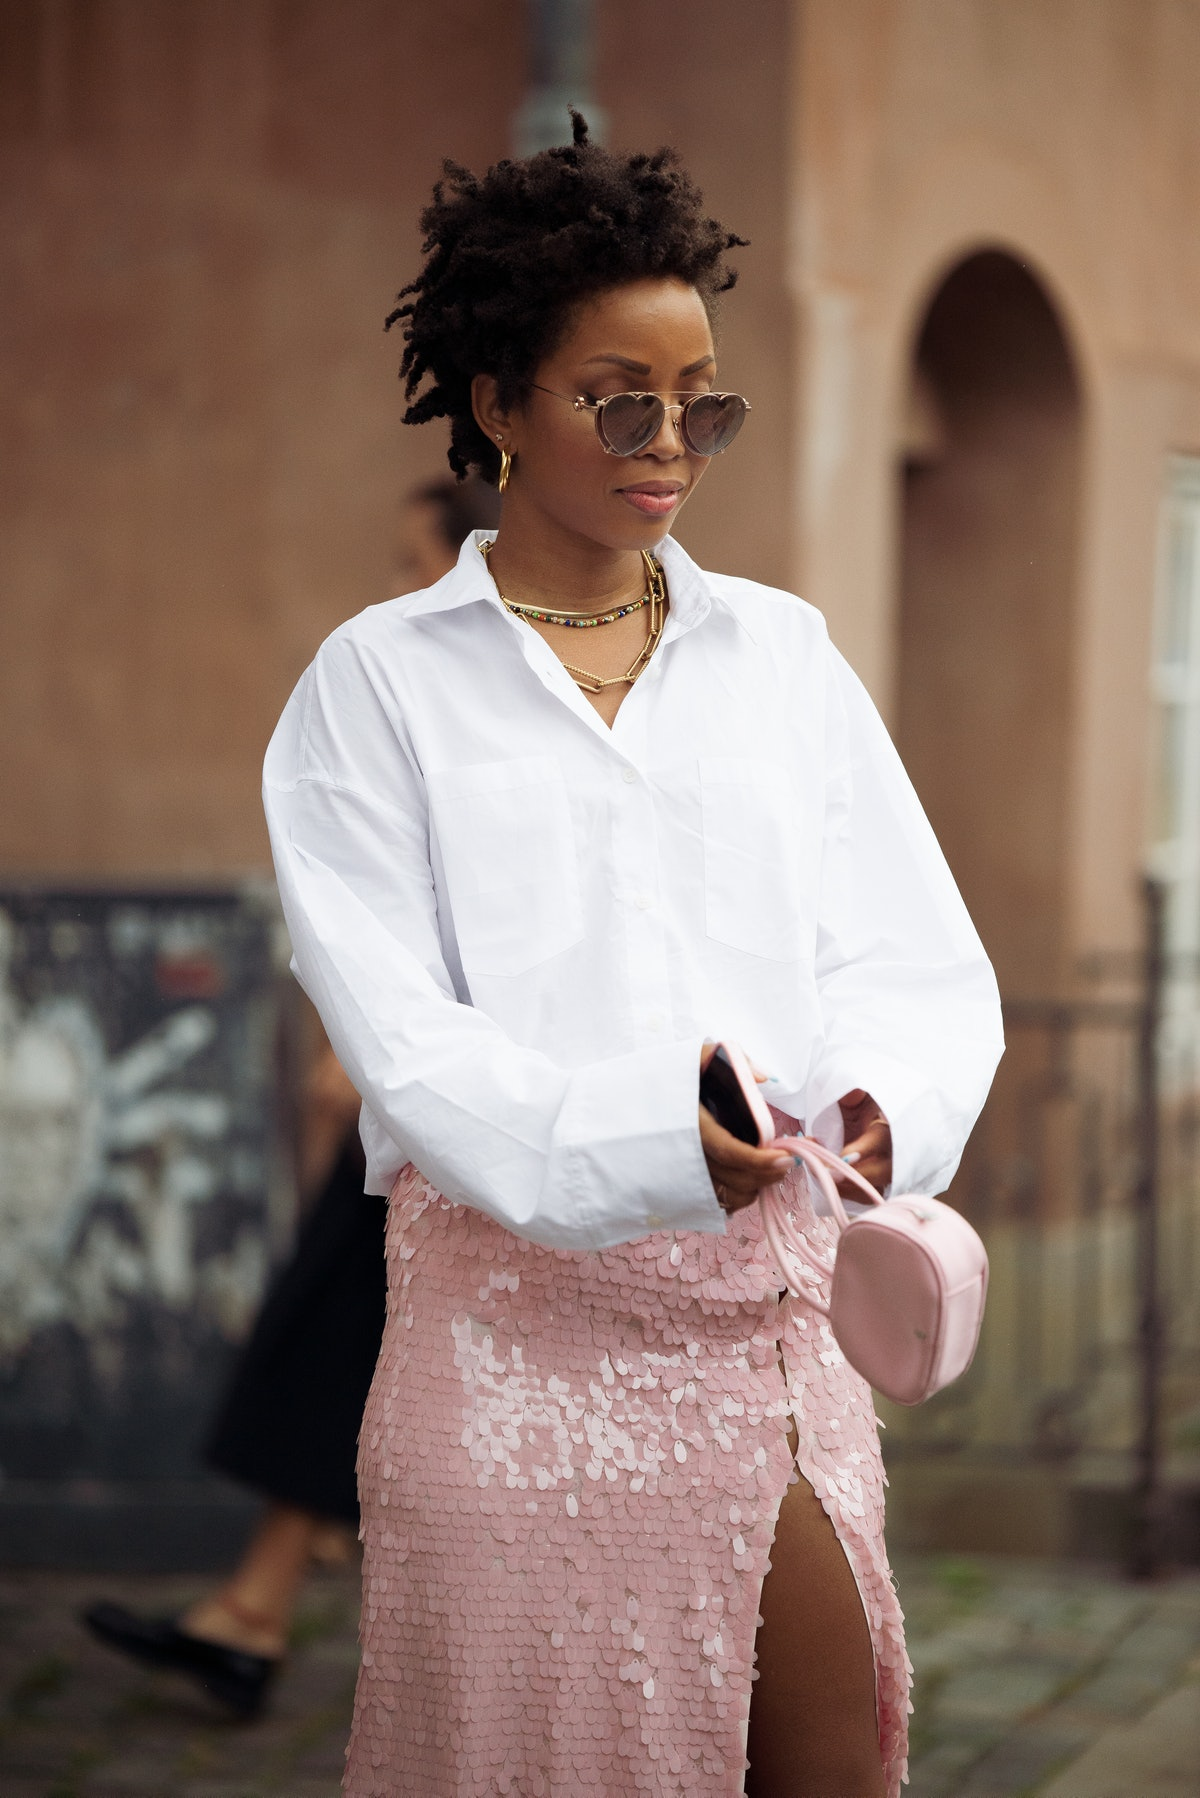 COPENHAGEN, DENMARK - AUGUST 10: Elizabeth Delphine wearing white shirt and pink skirt with pink min...